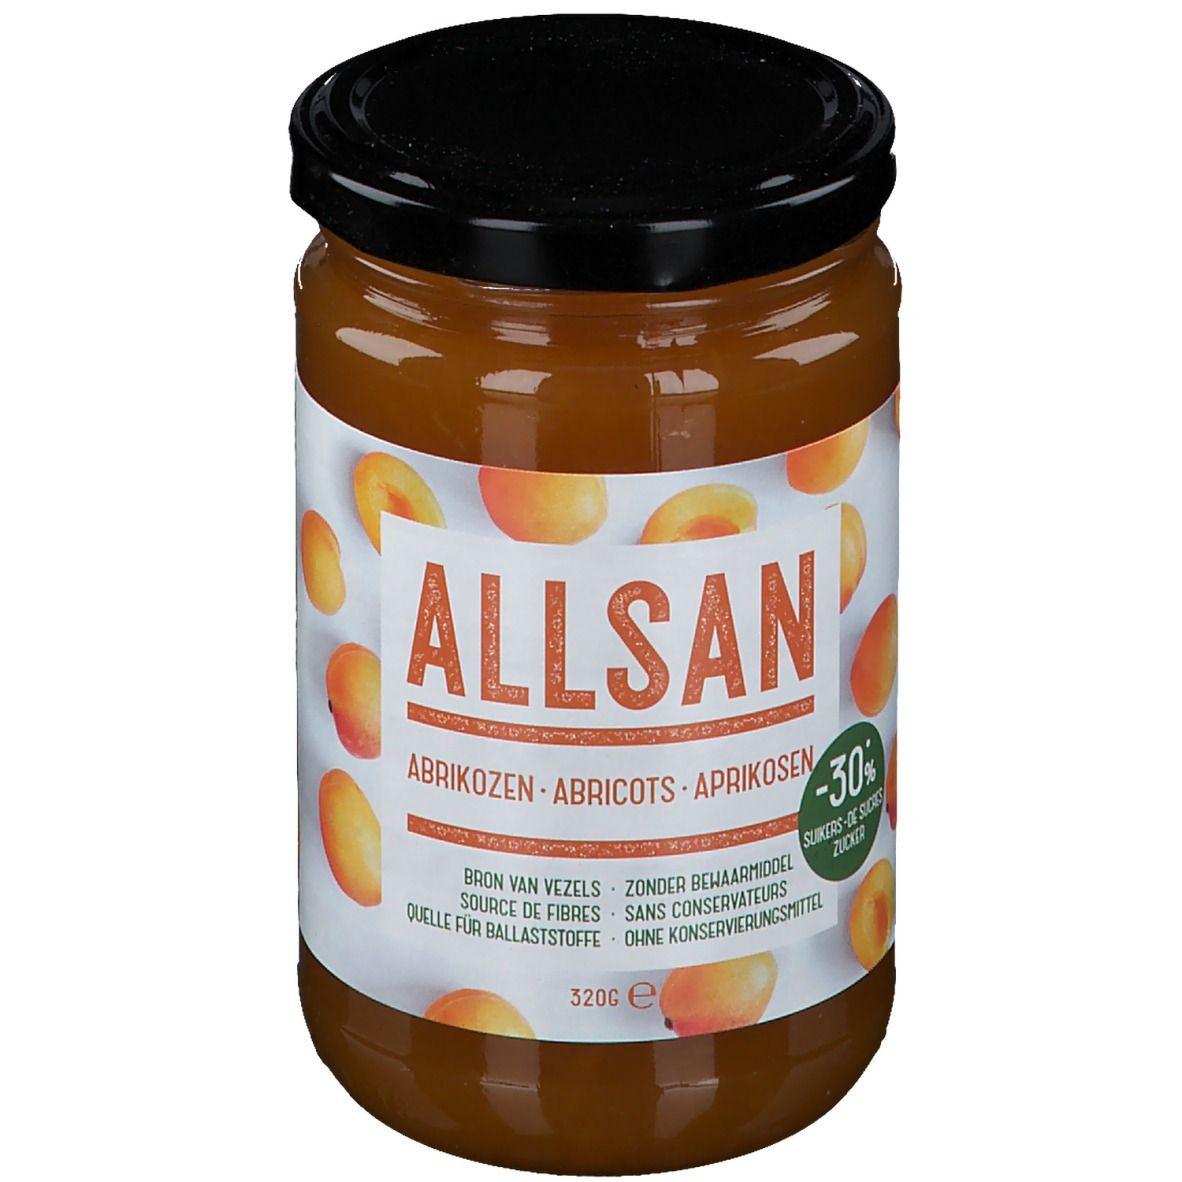 ALLSAN Pâte à tartiner Abricots g